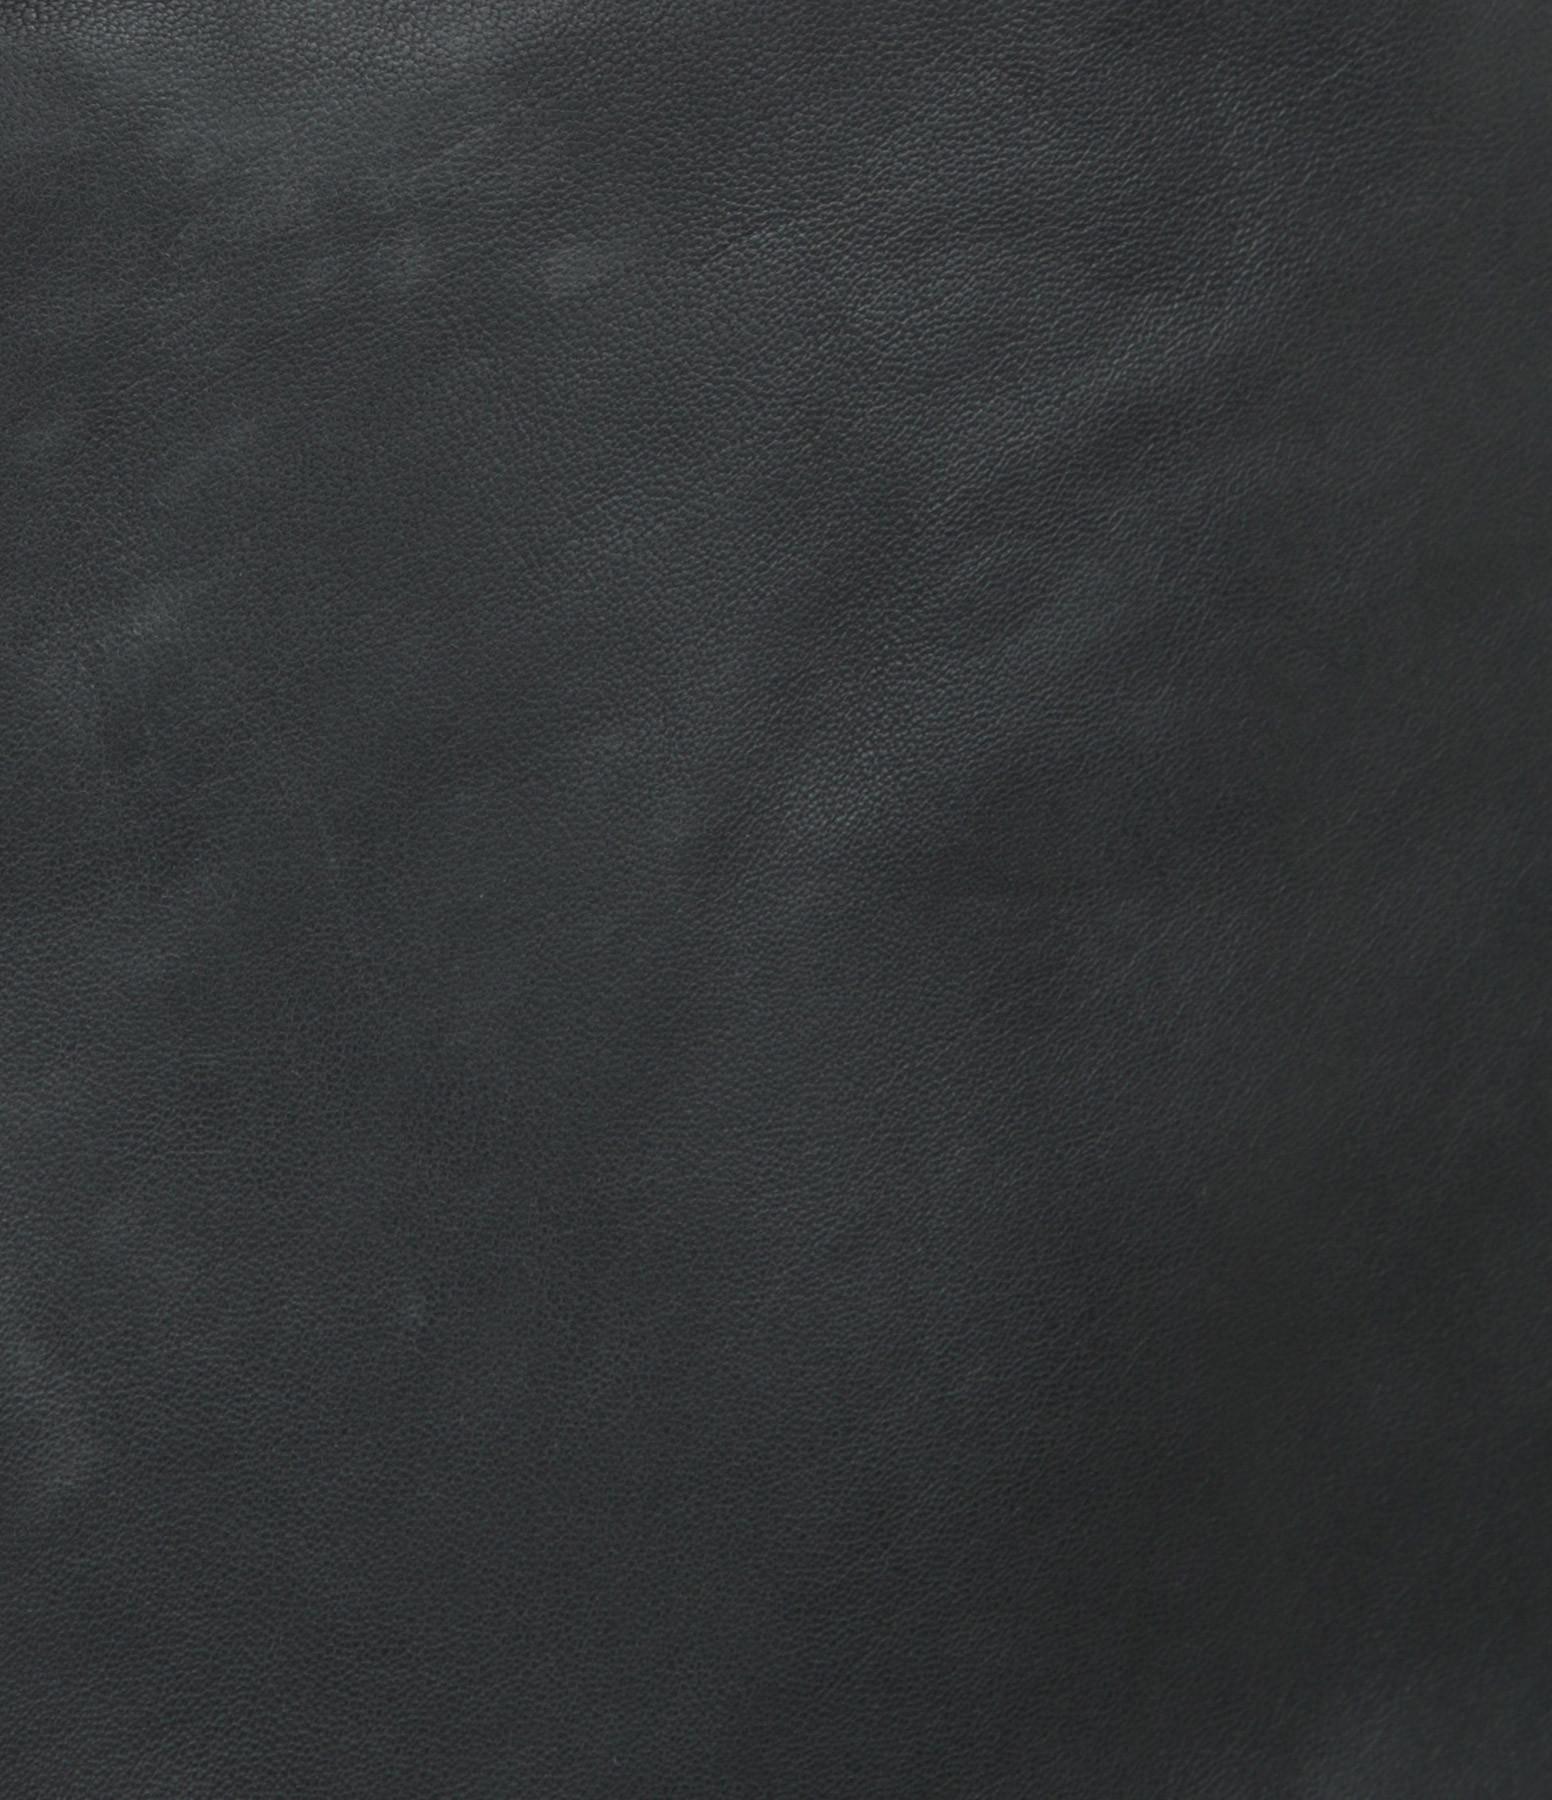 MAISON STANDARDS - Jupe Cuir Noir